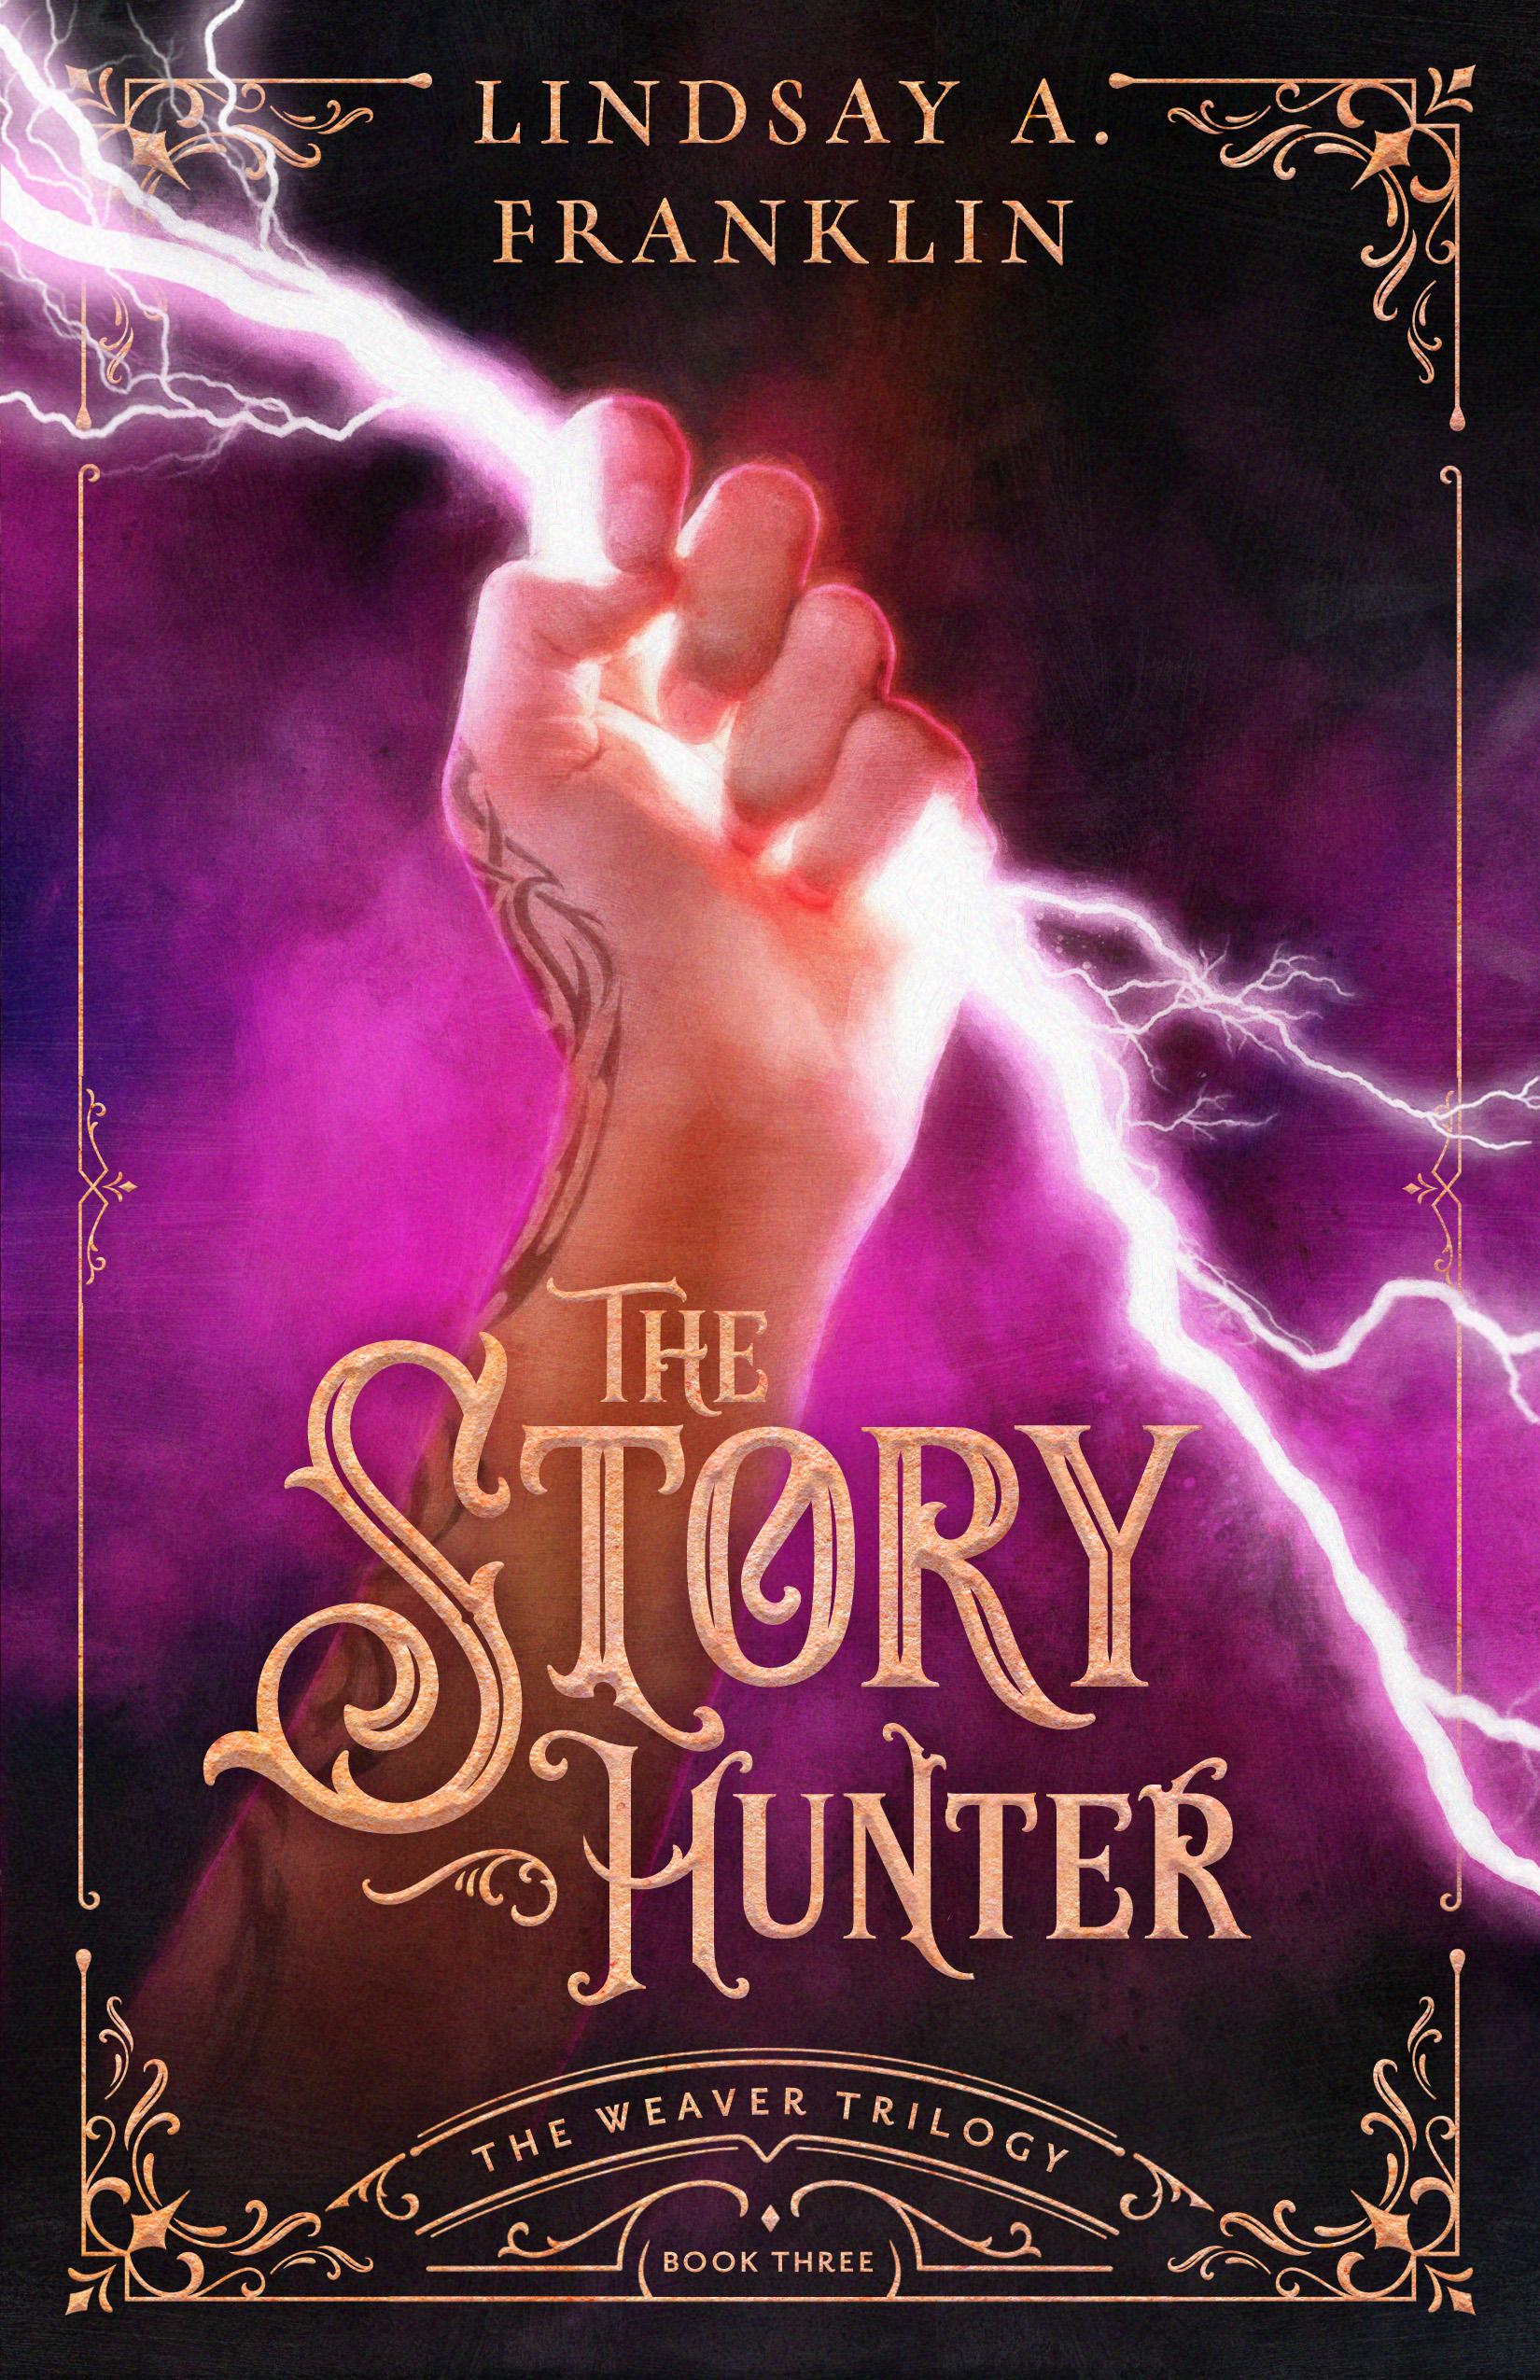 The Story Hunter, Lindsay A. Franklin